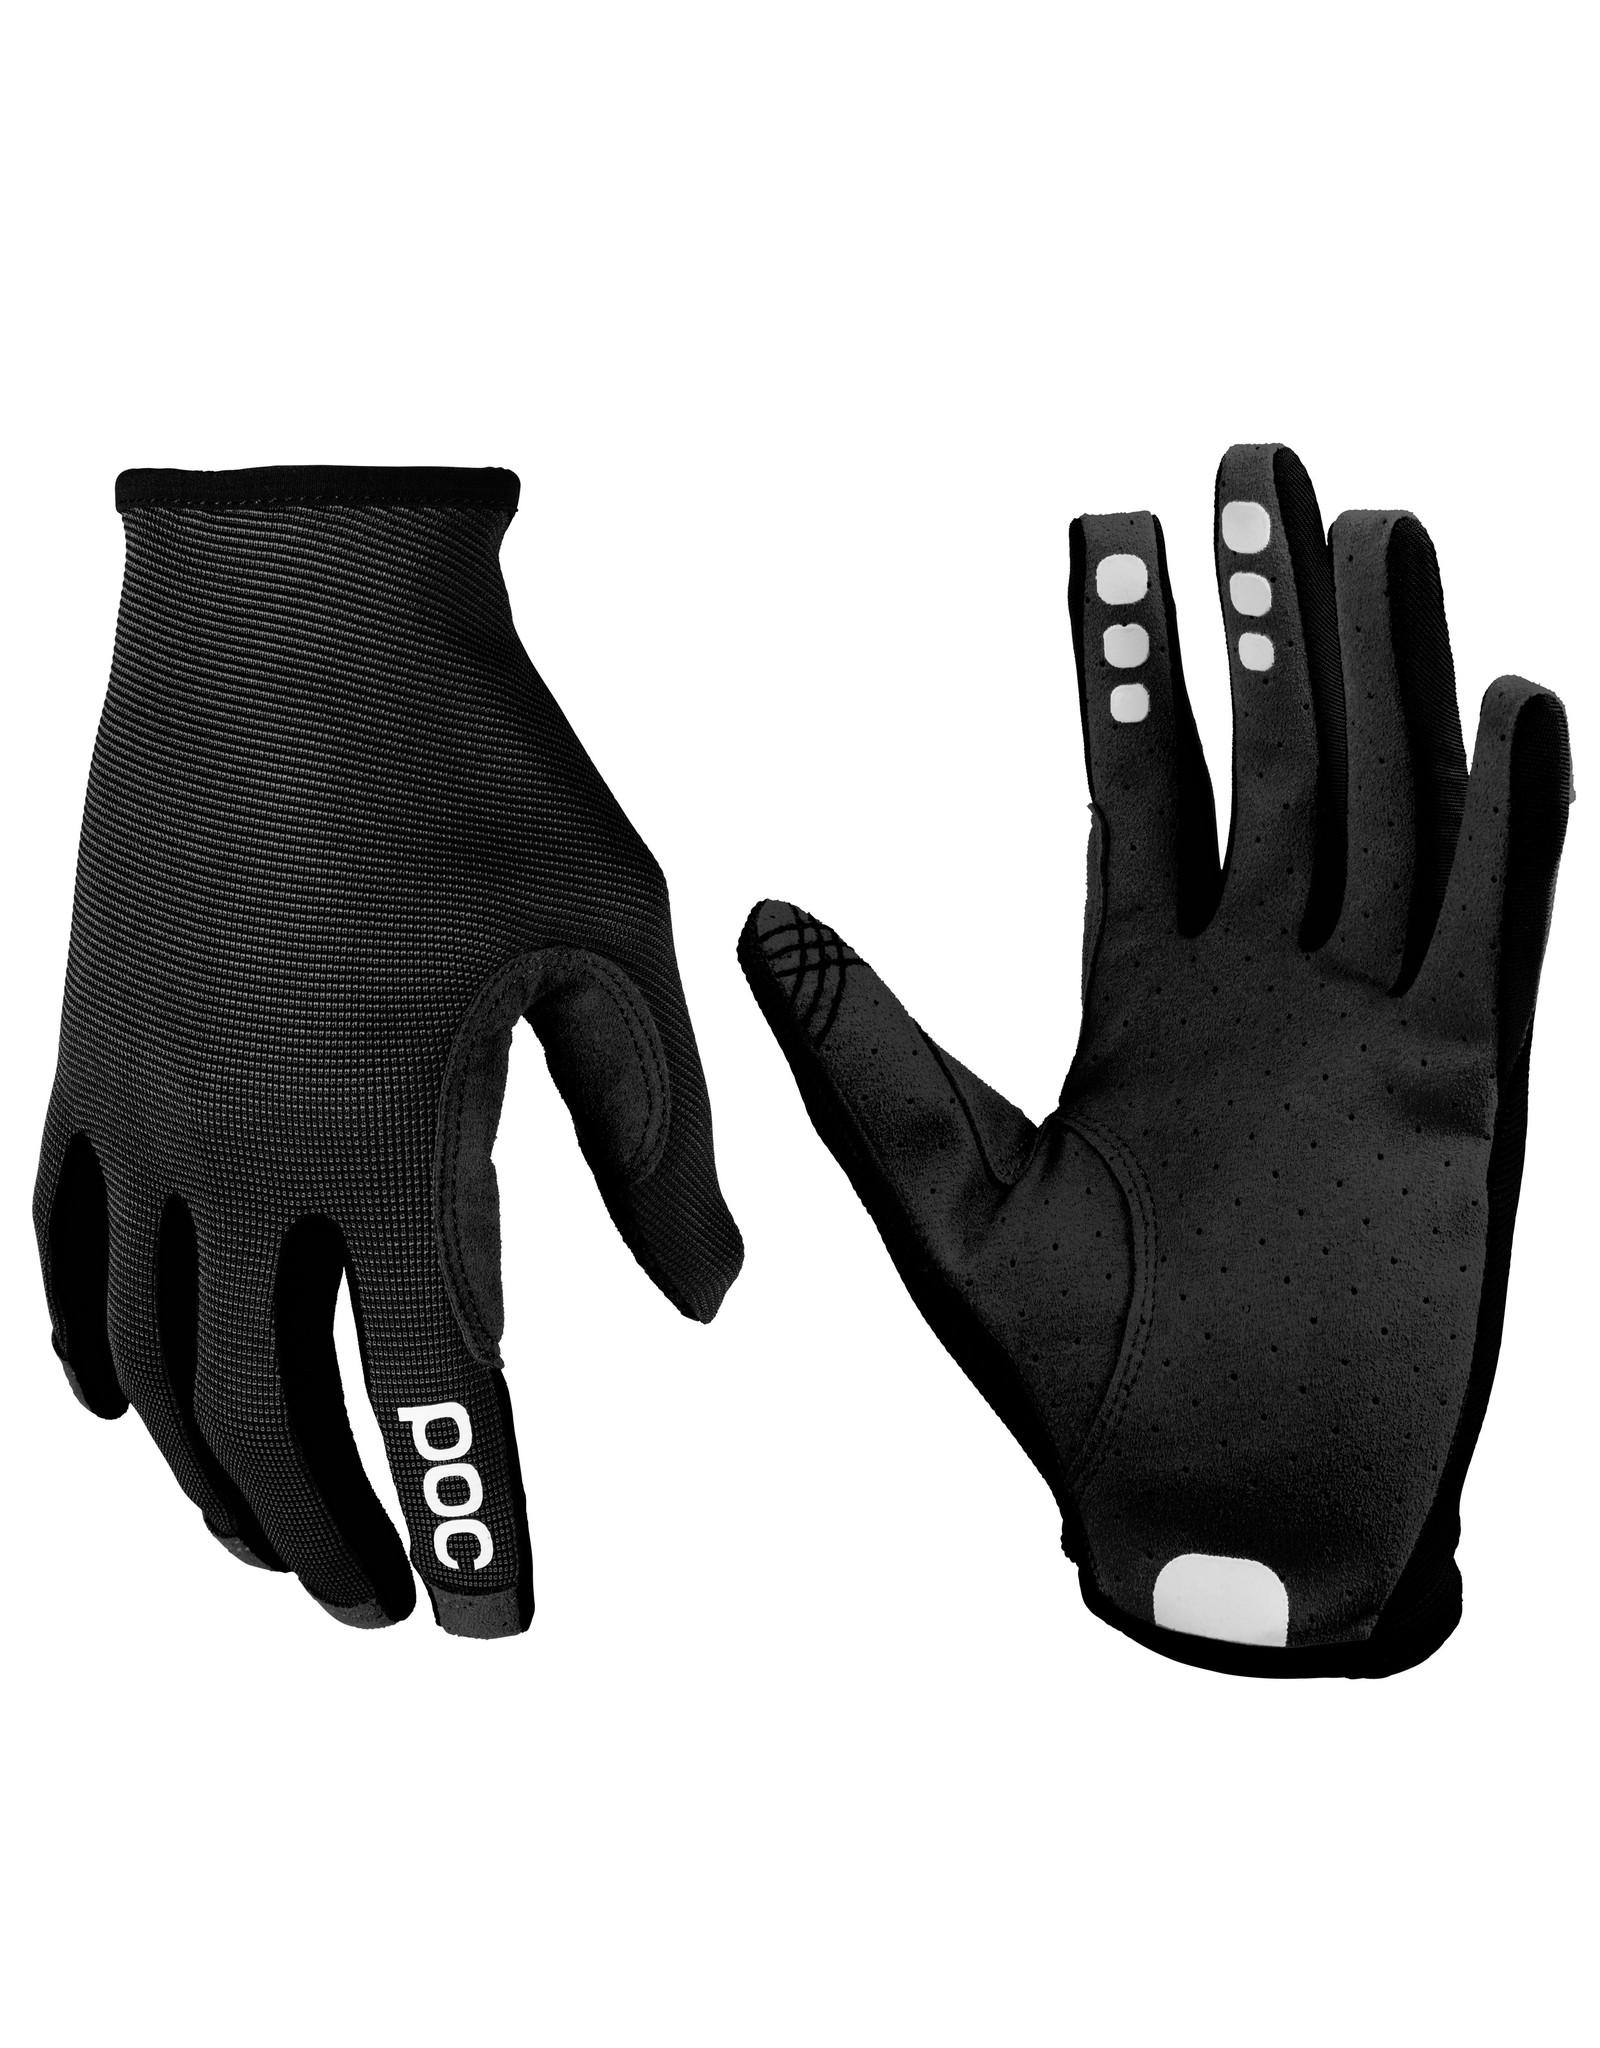 POC POC Resistance Enduro Glove